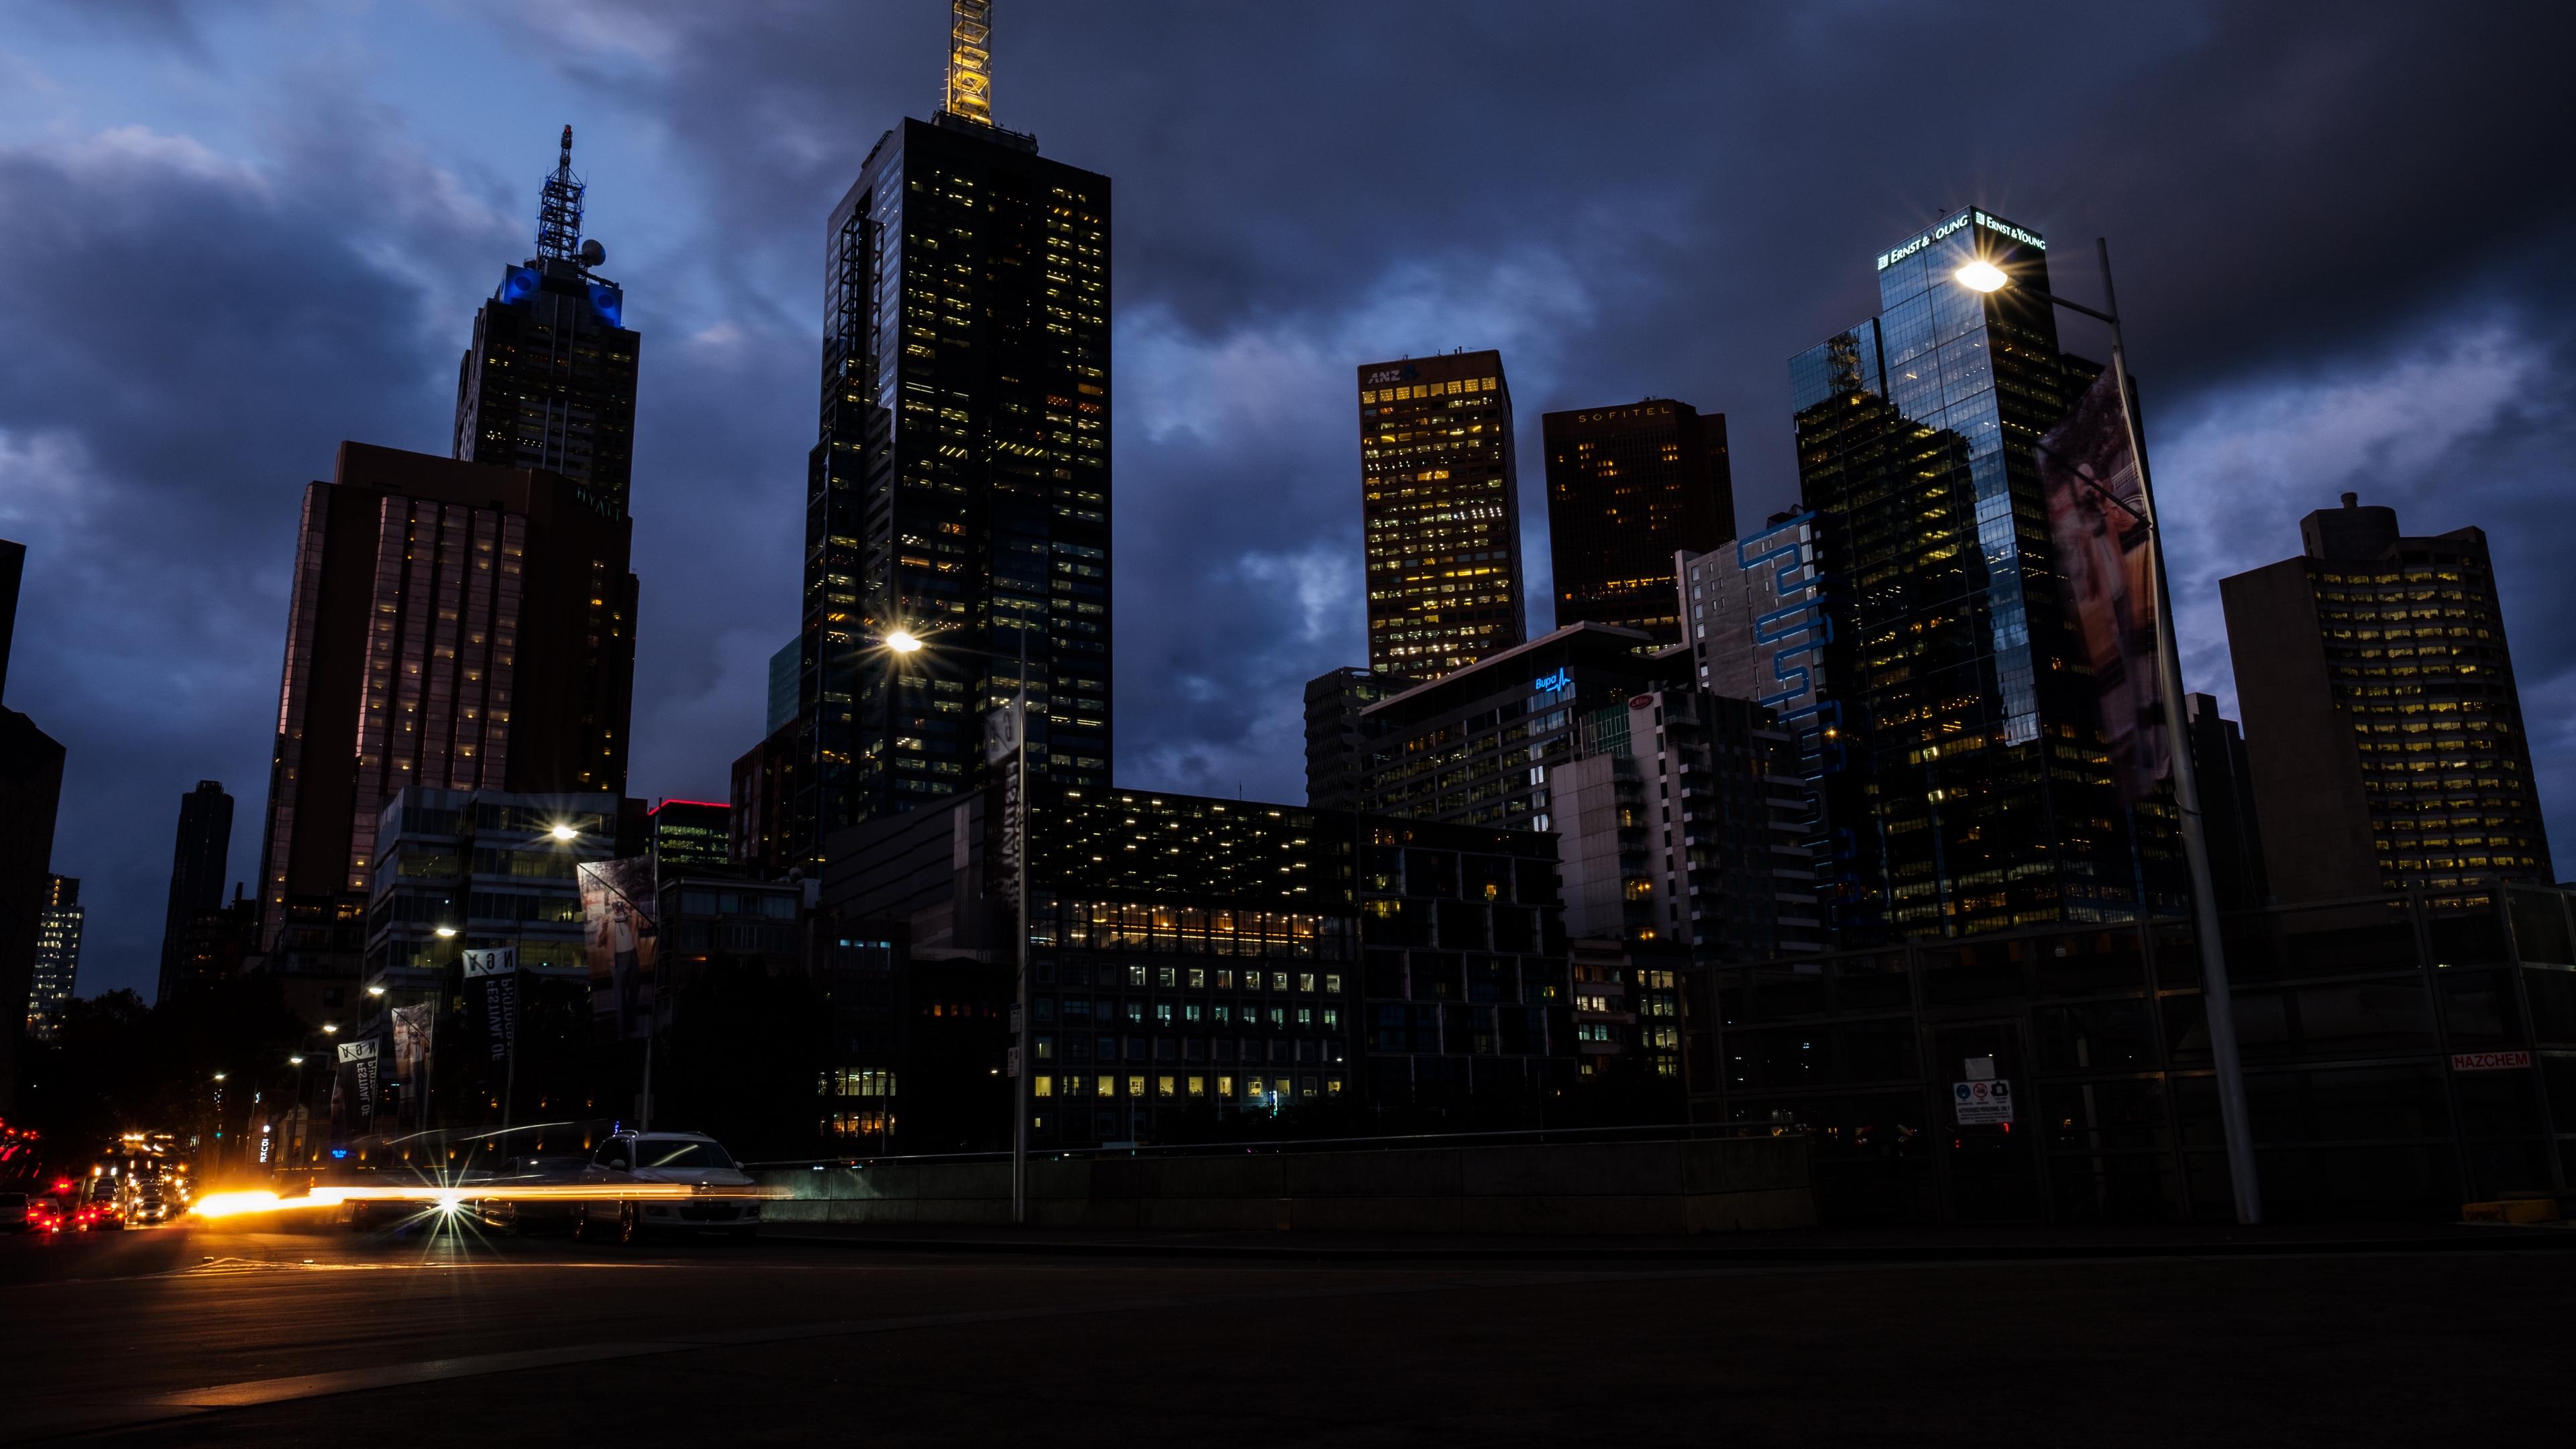 melbourne australia skyscrapers night 4k 1538066172 - melbourne, australia, skyscrapers, night 4k - Skyscrapers, Melbourne, Australia